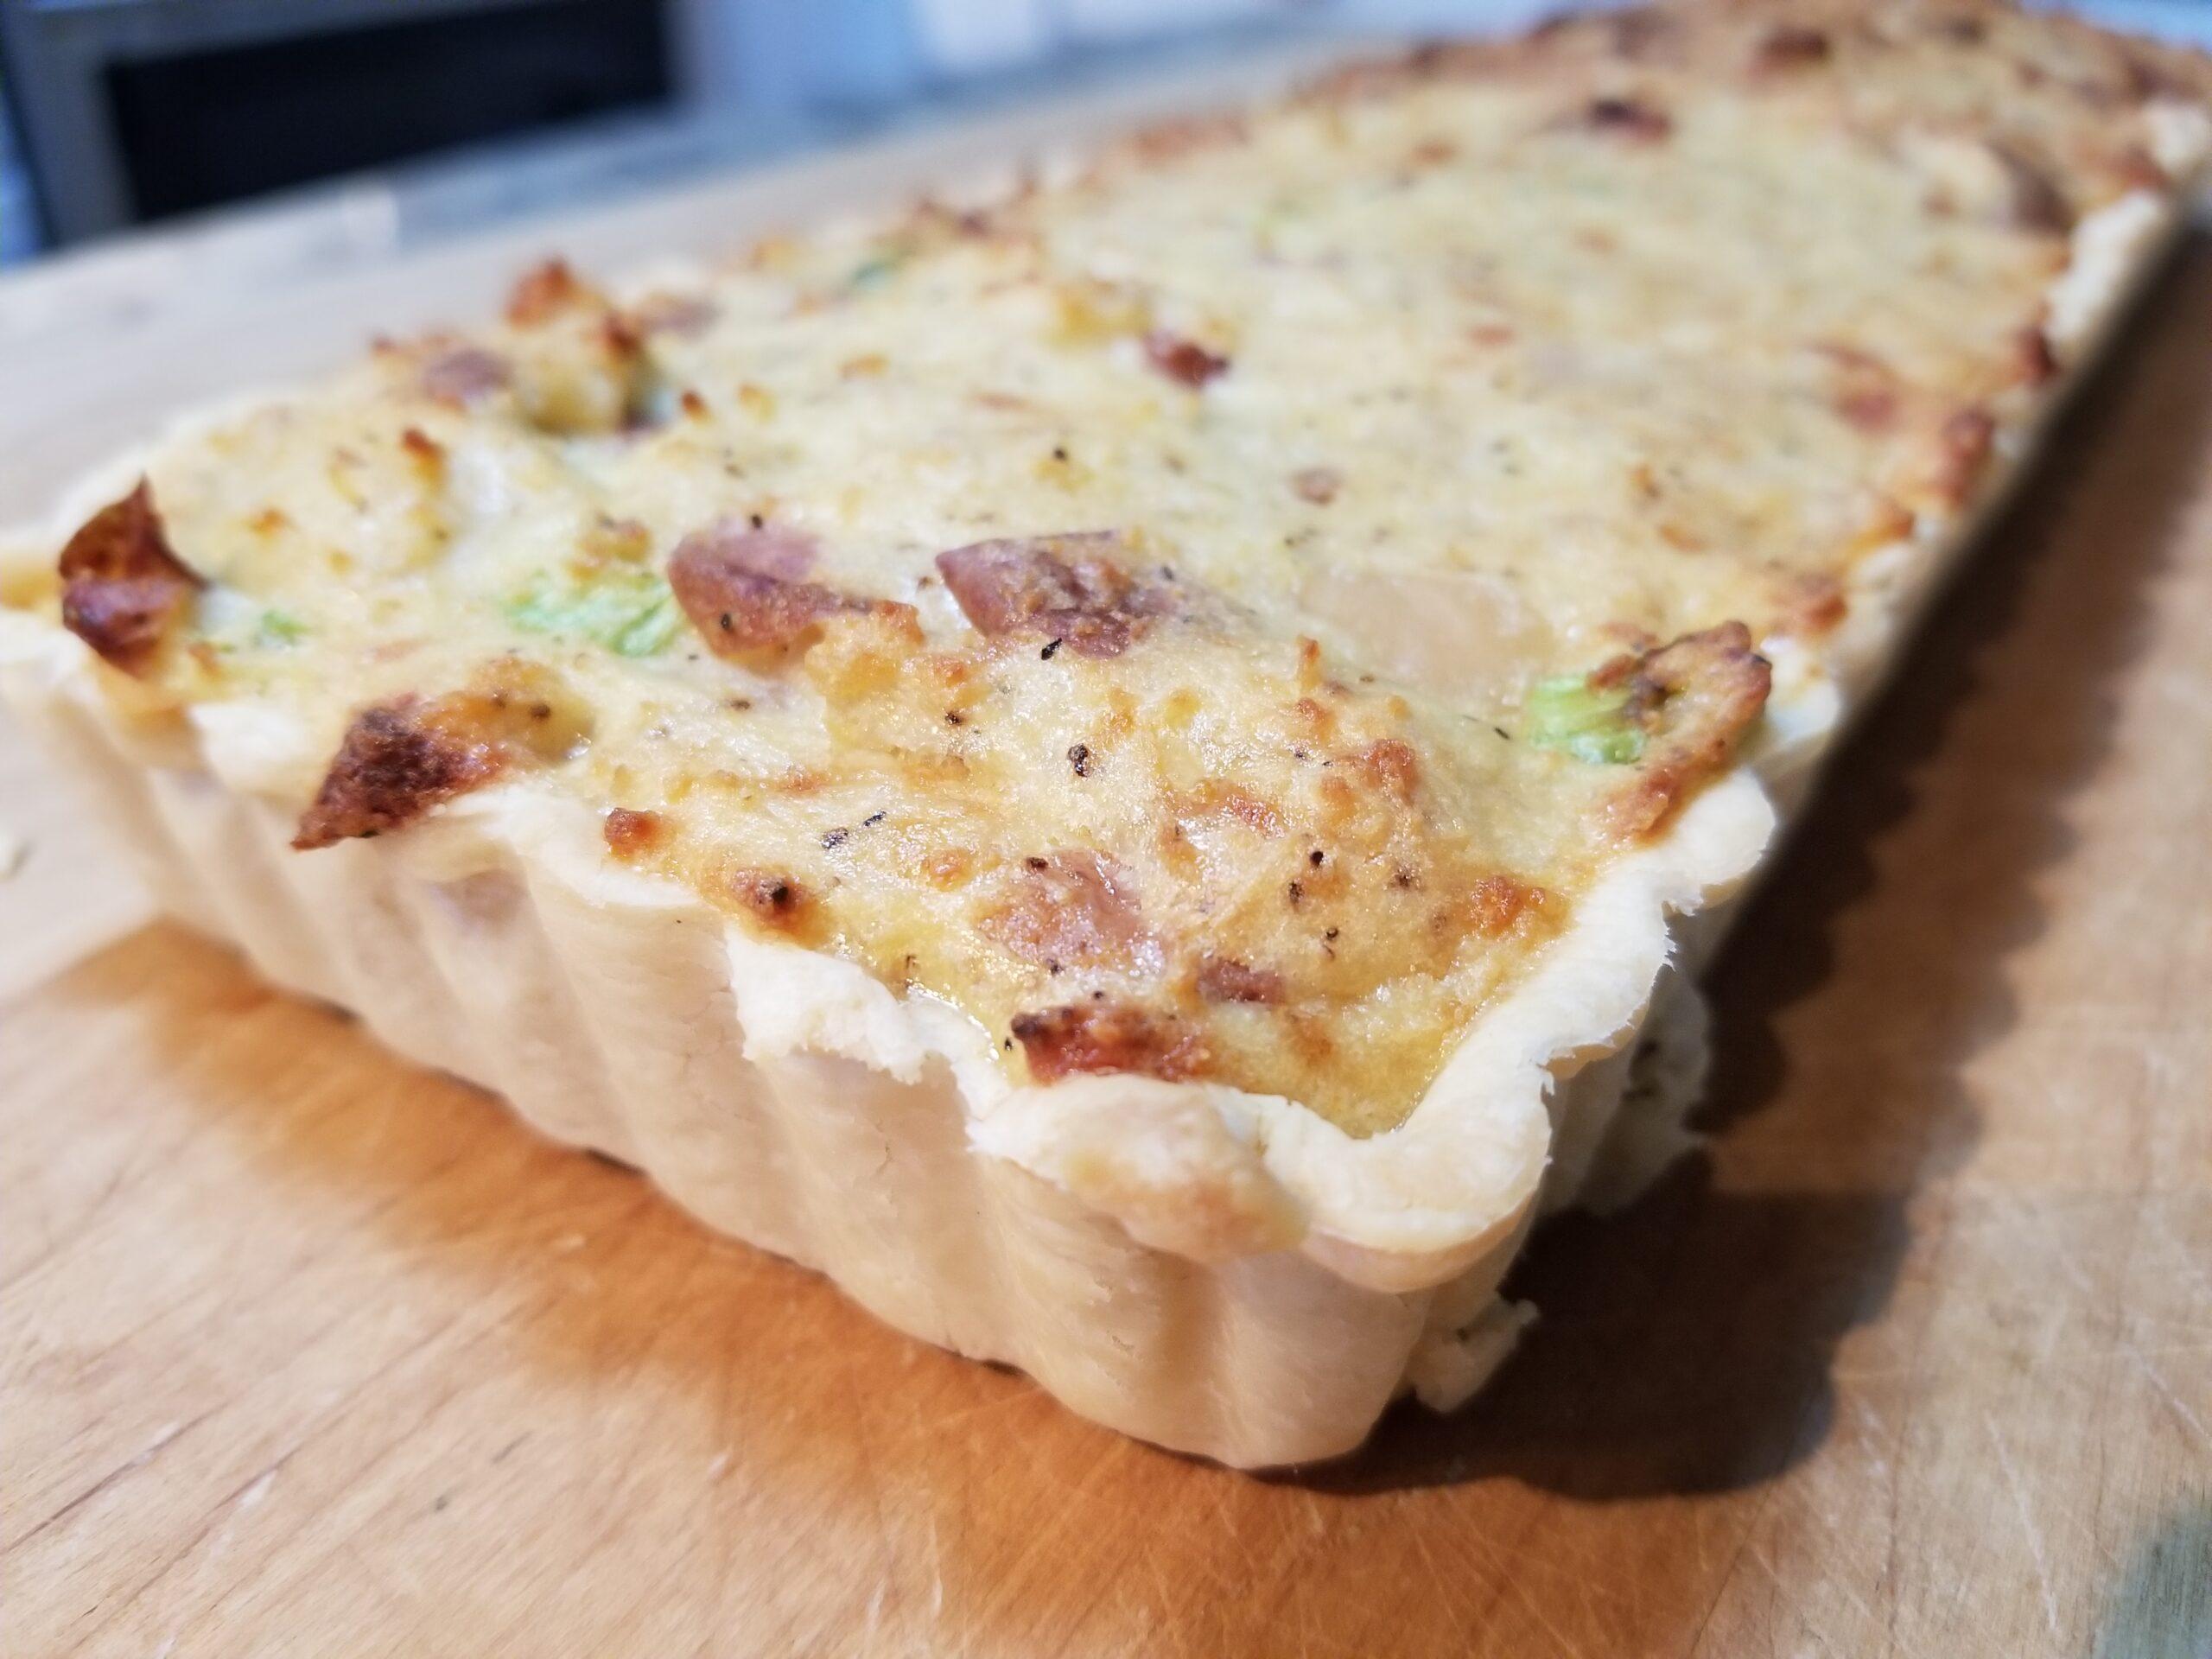 Cheese and potato pie